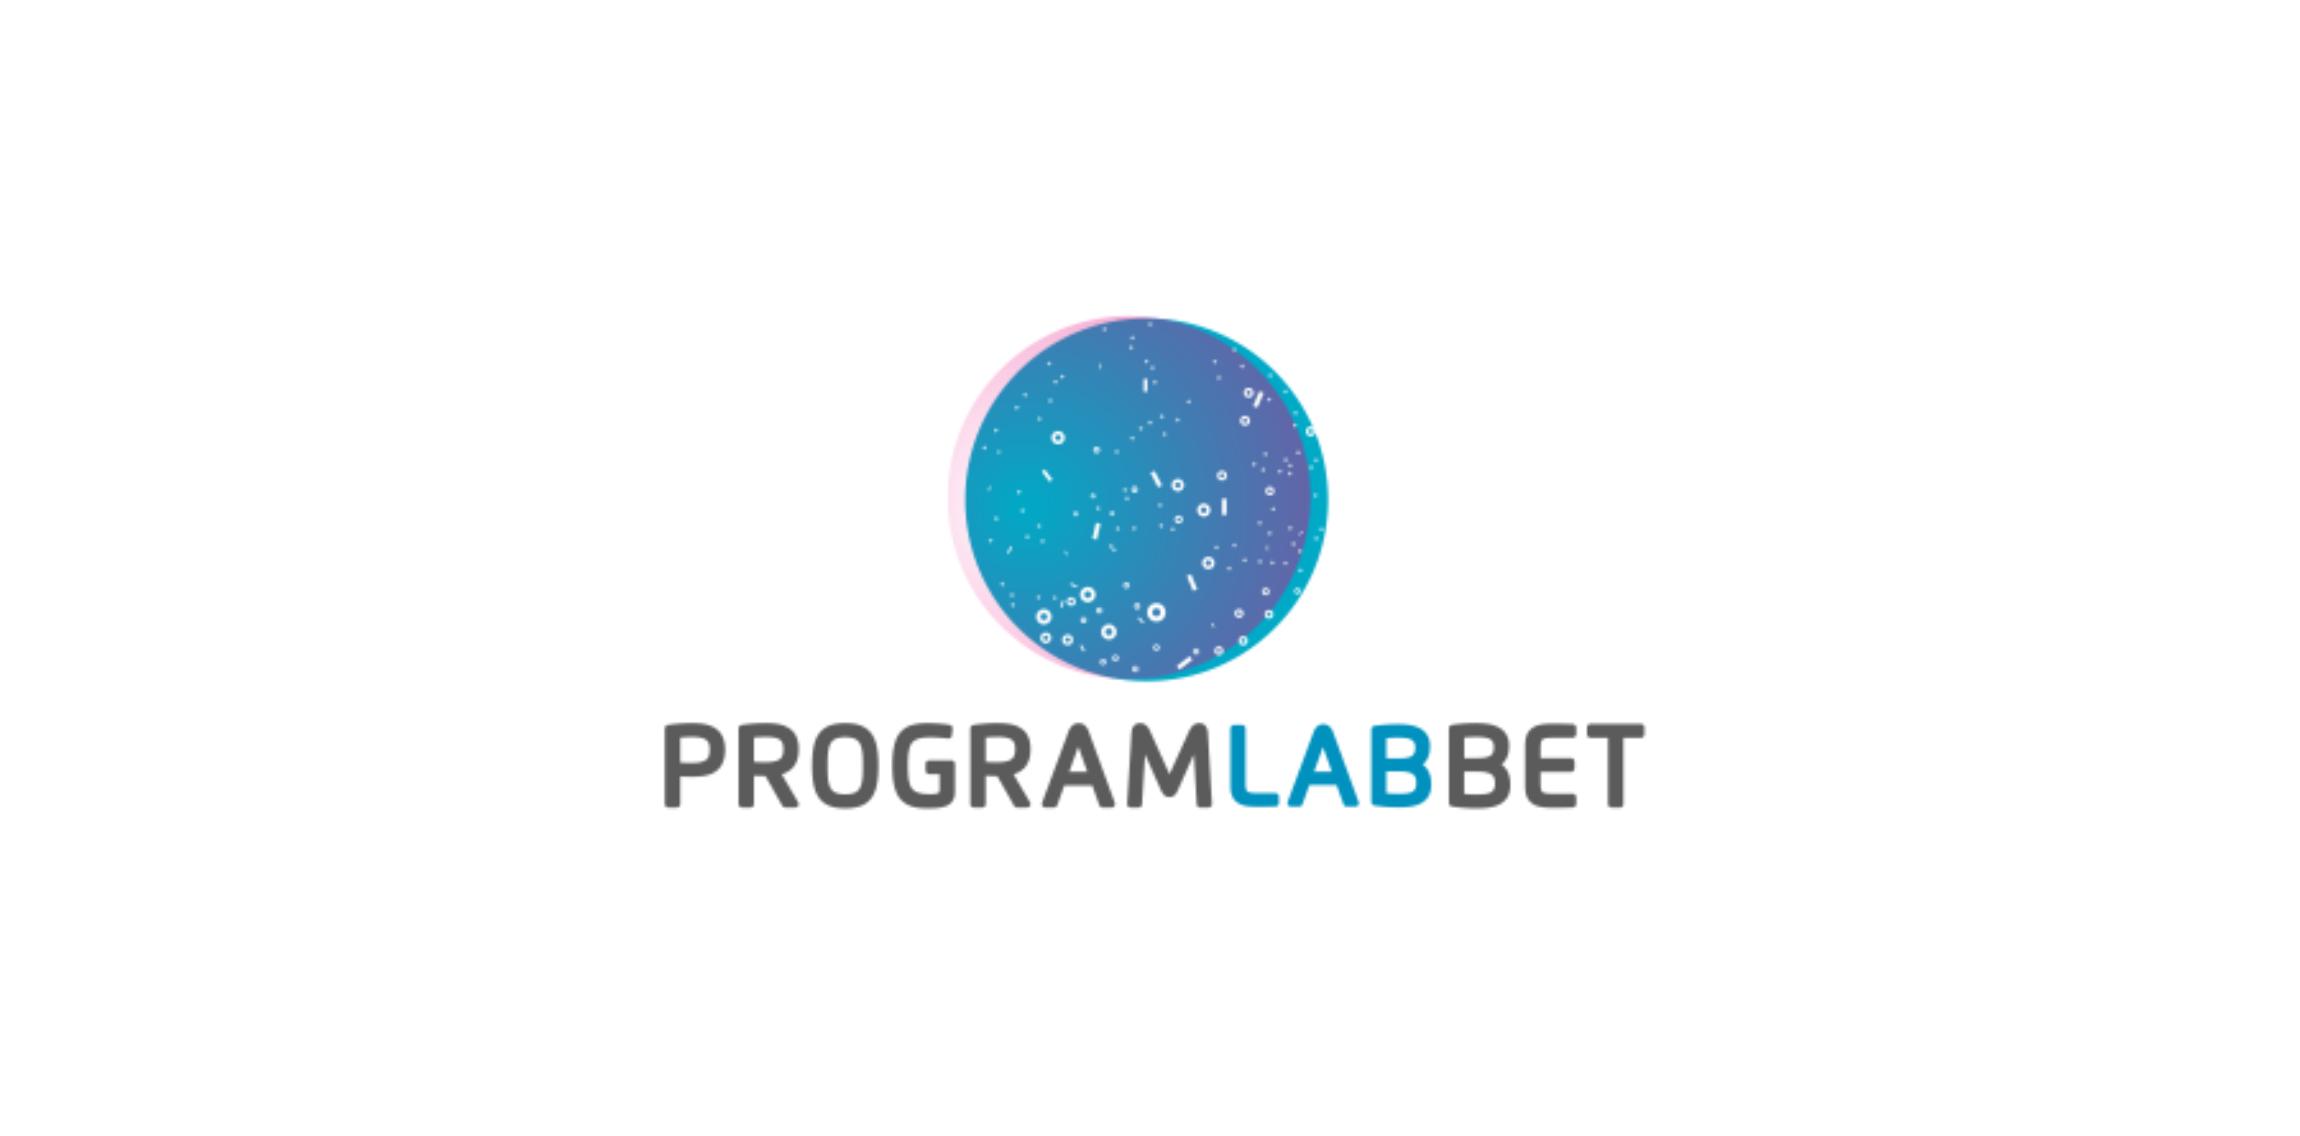 ProgramLabBet